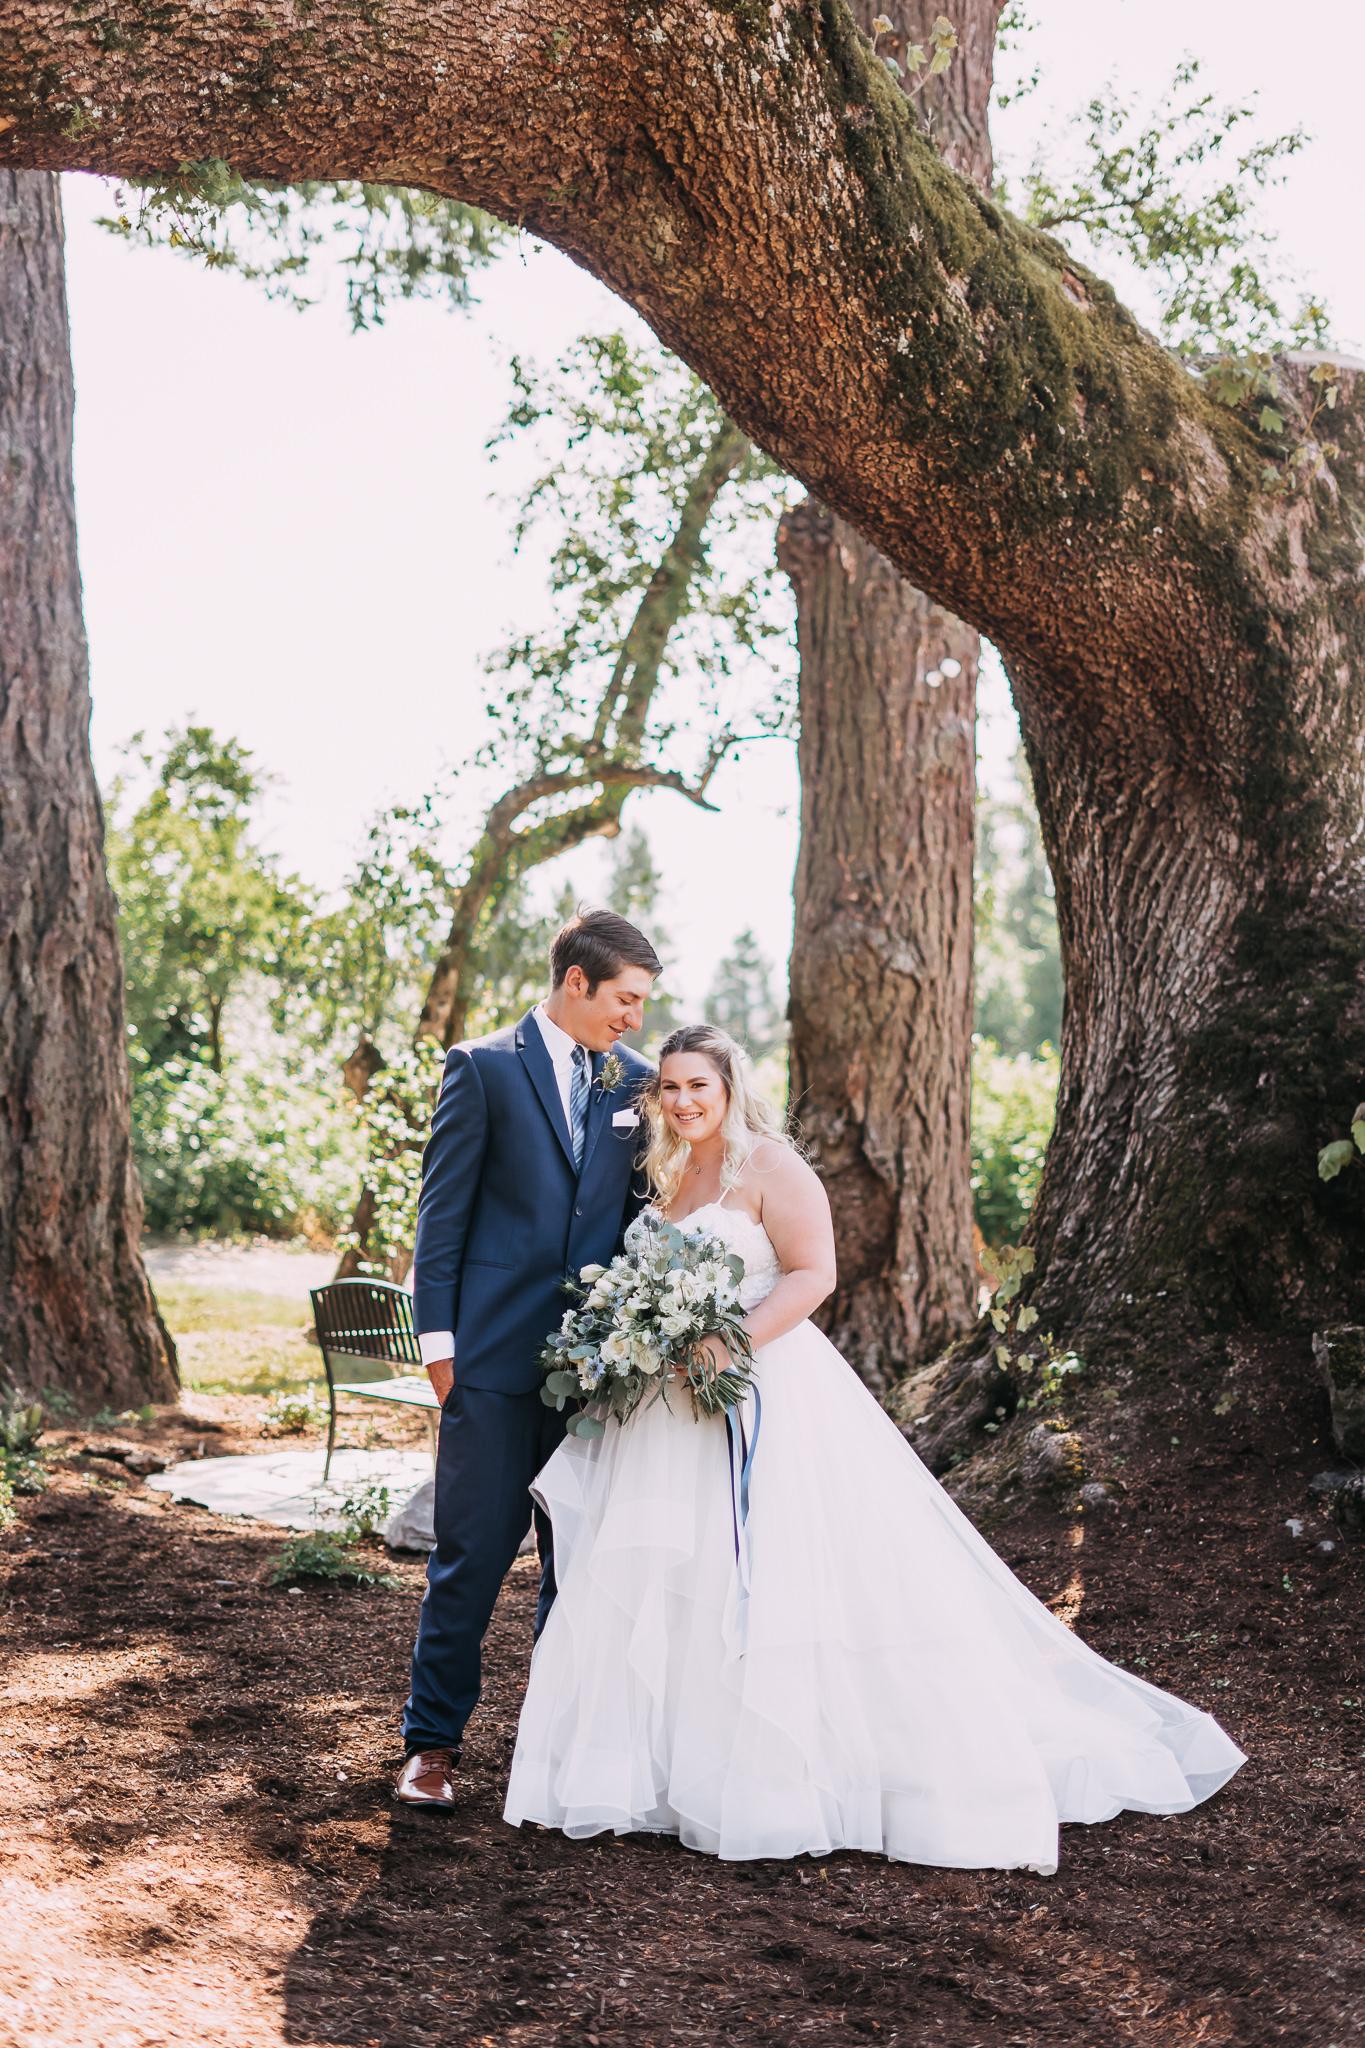 Vertical portrait mode bride groom formal wedding shoot